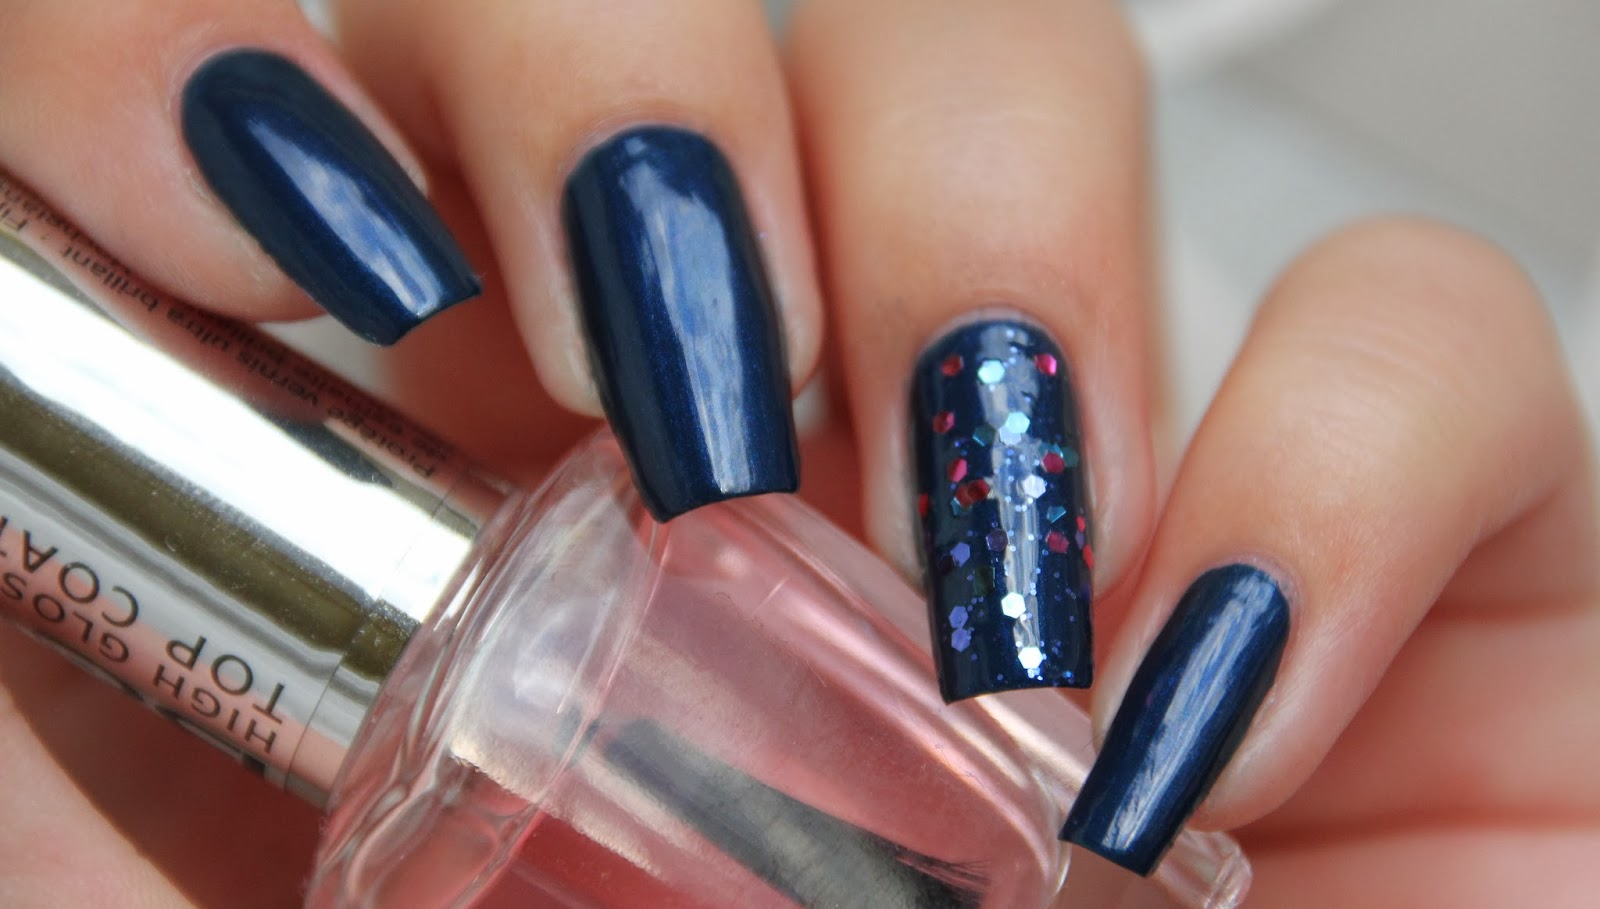 lacquervictim duo nagellack winerot glitter blue. Black Bedroom Furniture Sets. Home Design Ideas